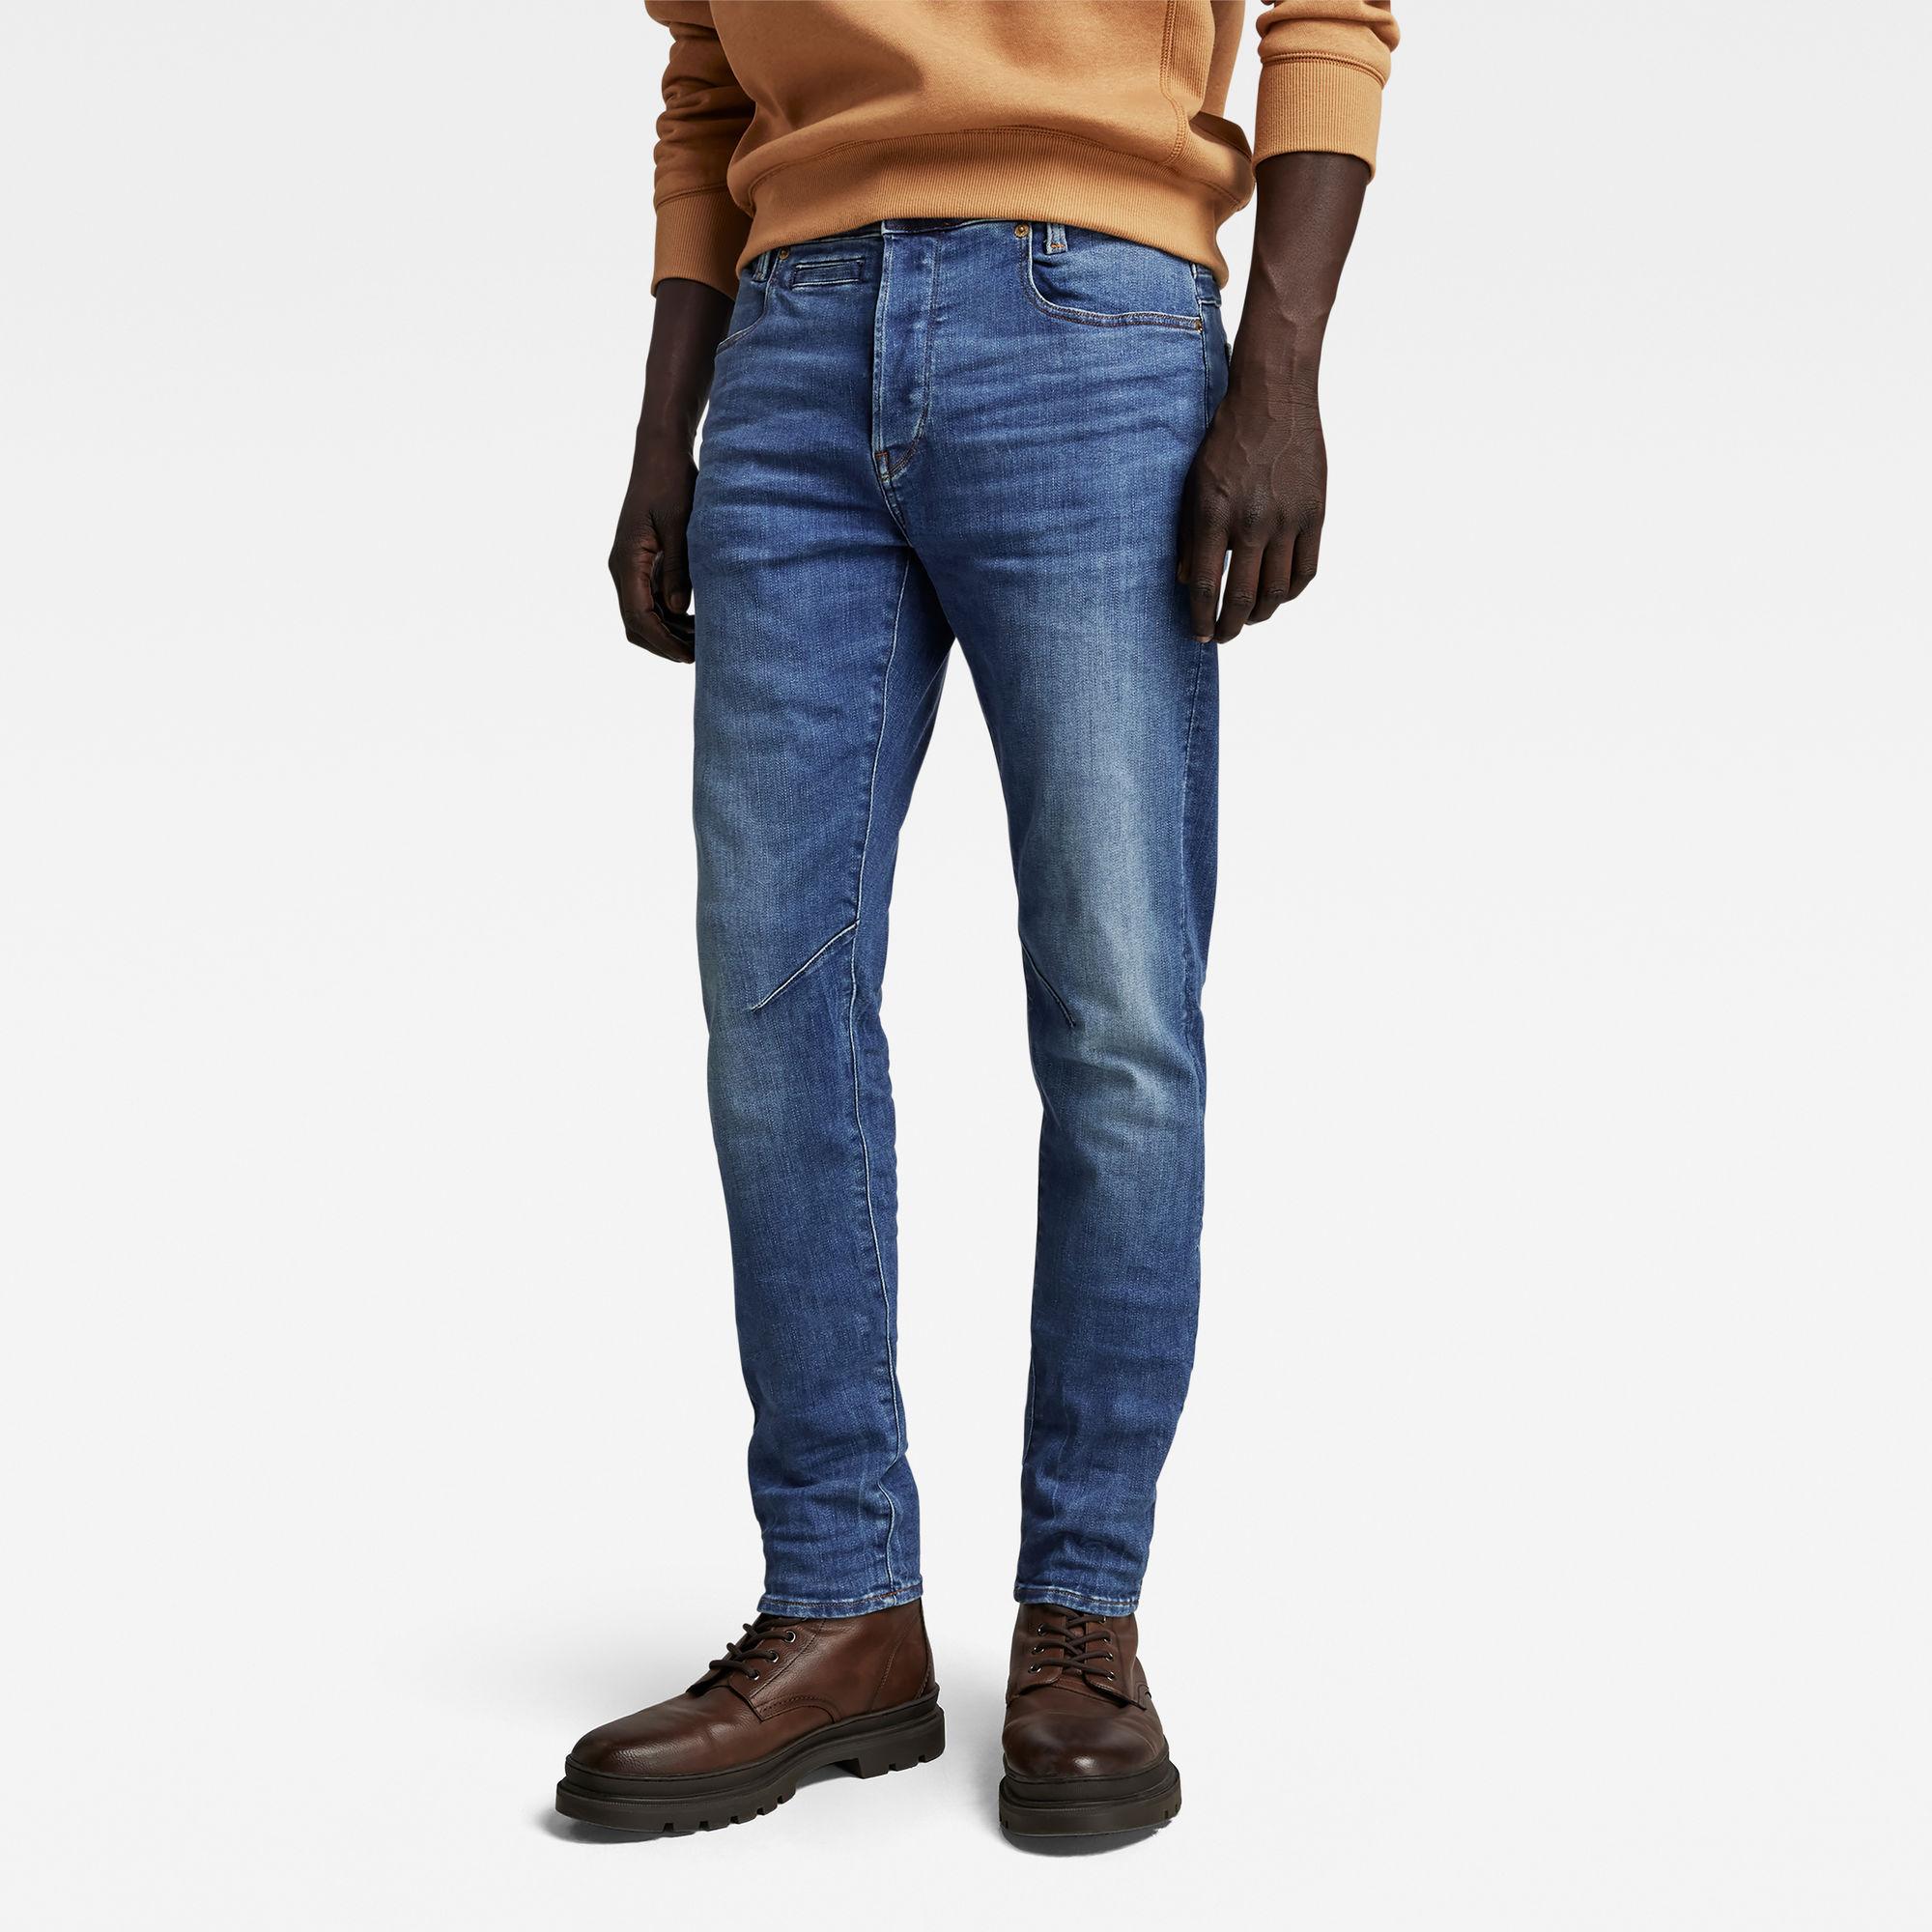 Image of G Star Raw D-Staq 5-Pocket Slim Jeans